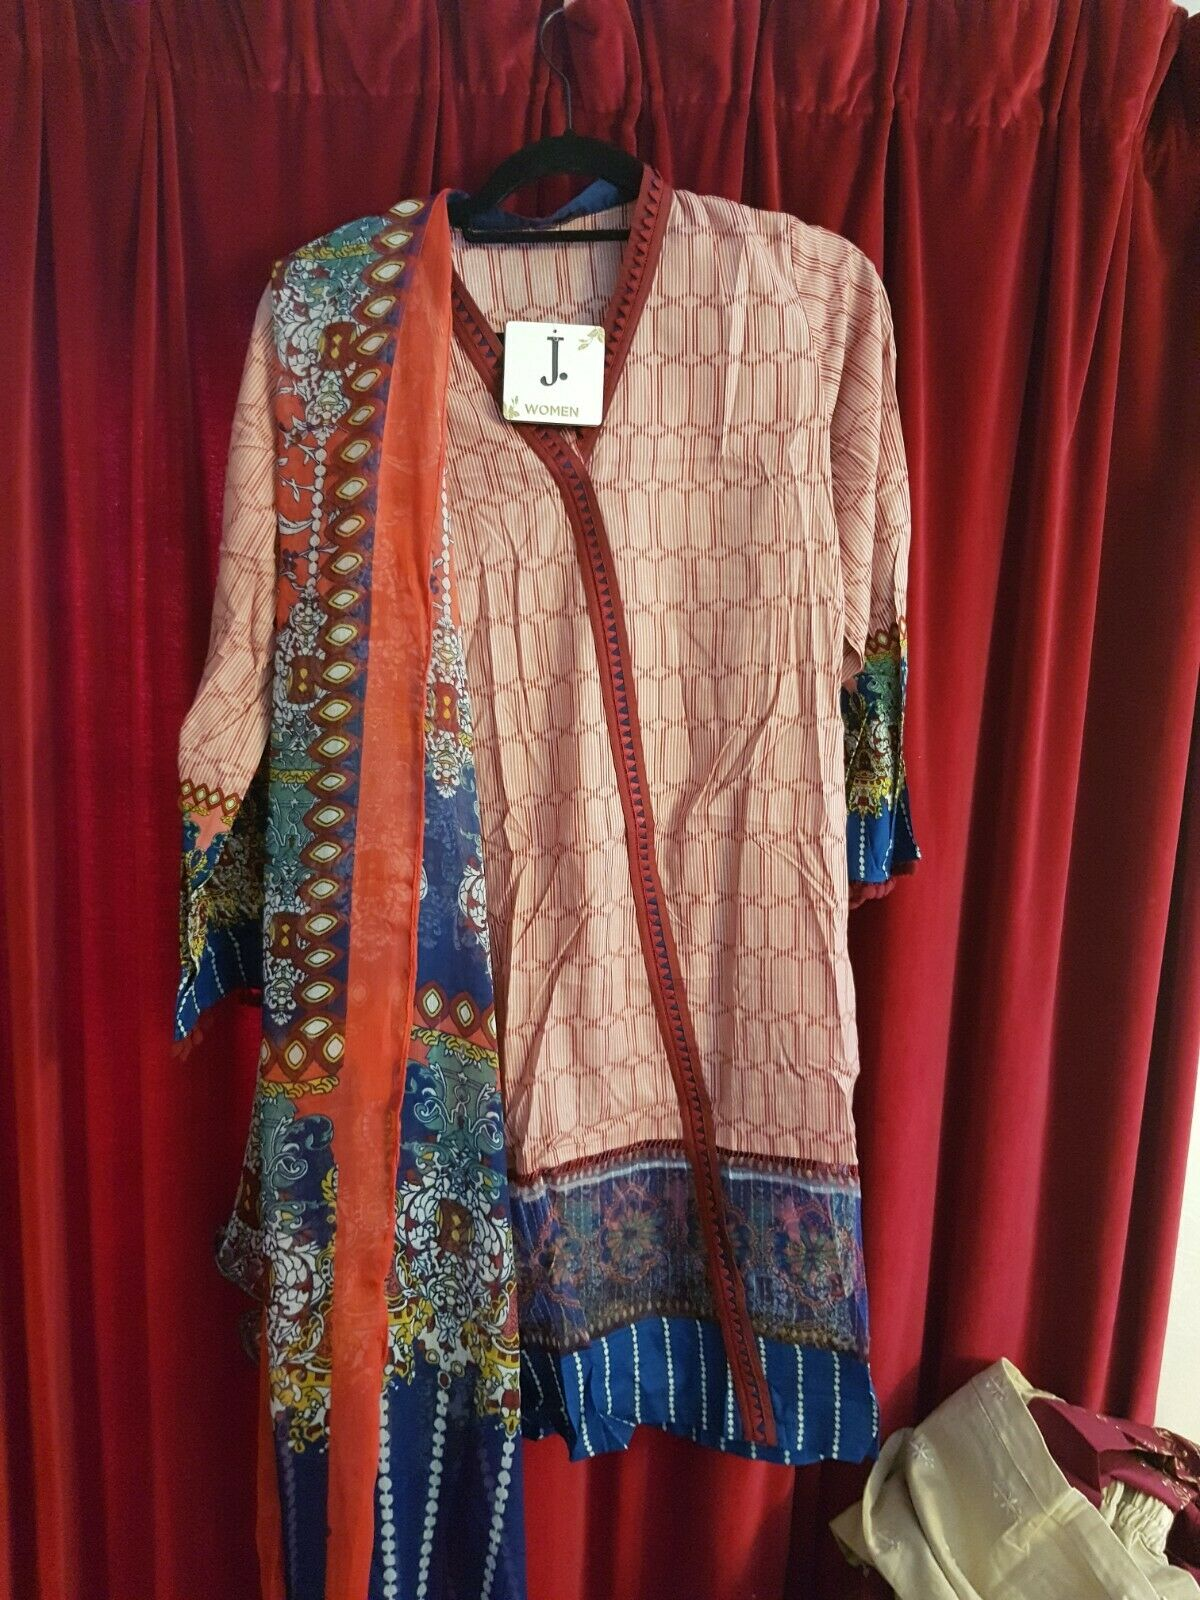 Asian Pakistani designer Junaid jamshed 100% original embroidered outfit.